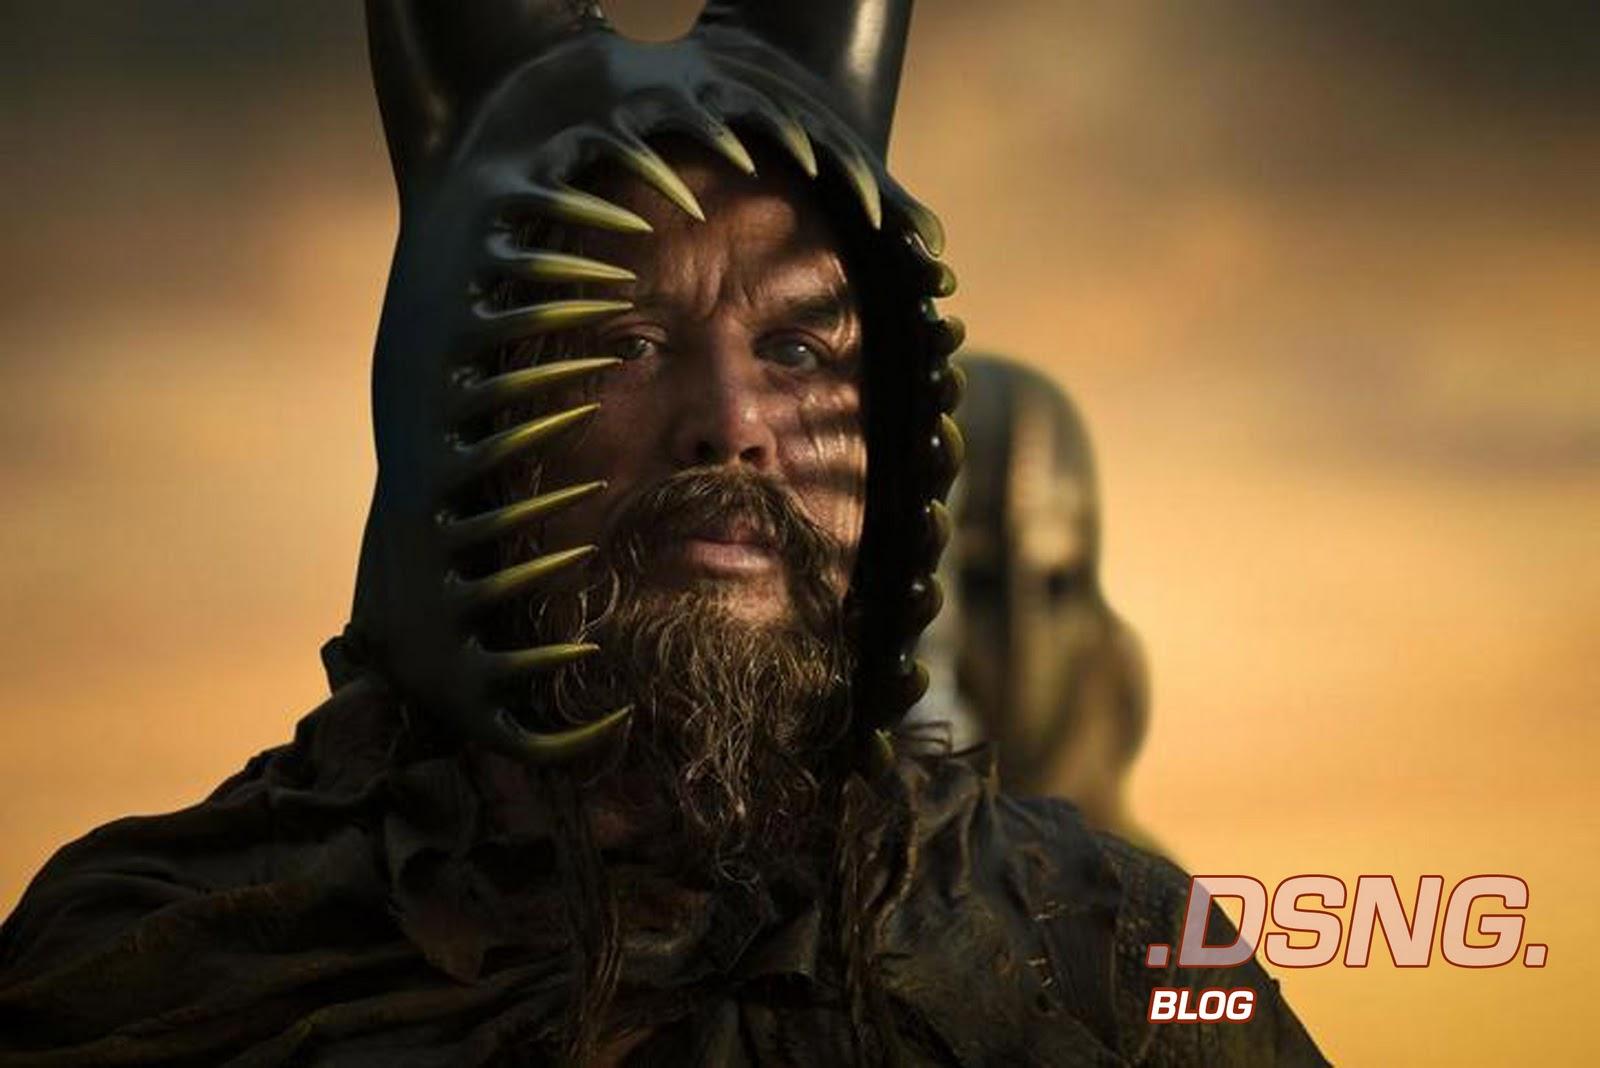 http://2.bp.blogspot.com/-C4mZqm_G7AE/Tr9QpRB72LI/AAAAAAAACKI/Gh25apkhIDA/s1600/IMMOTRALS+2011+MOVIE+HENRY+CAVIL+KING+HYPERION+MICKEY+NICKEY+ROURKE.jpg